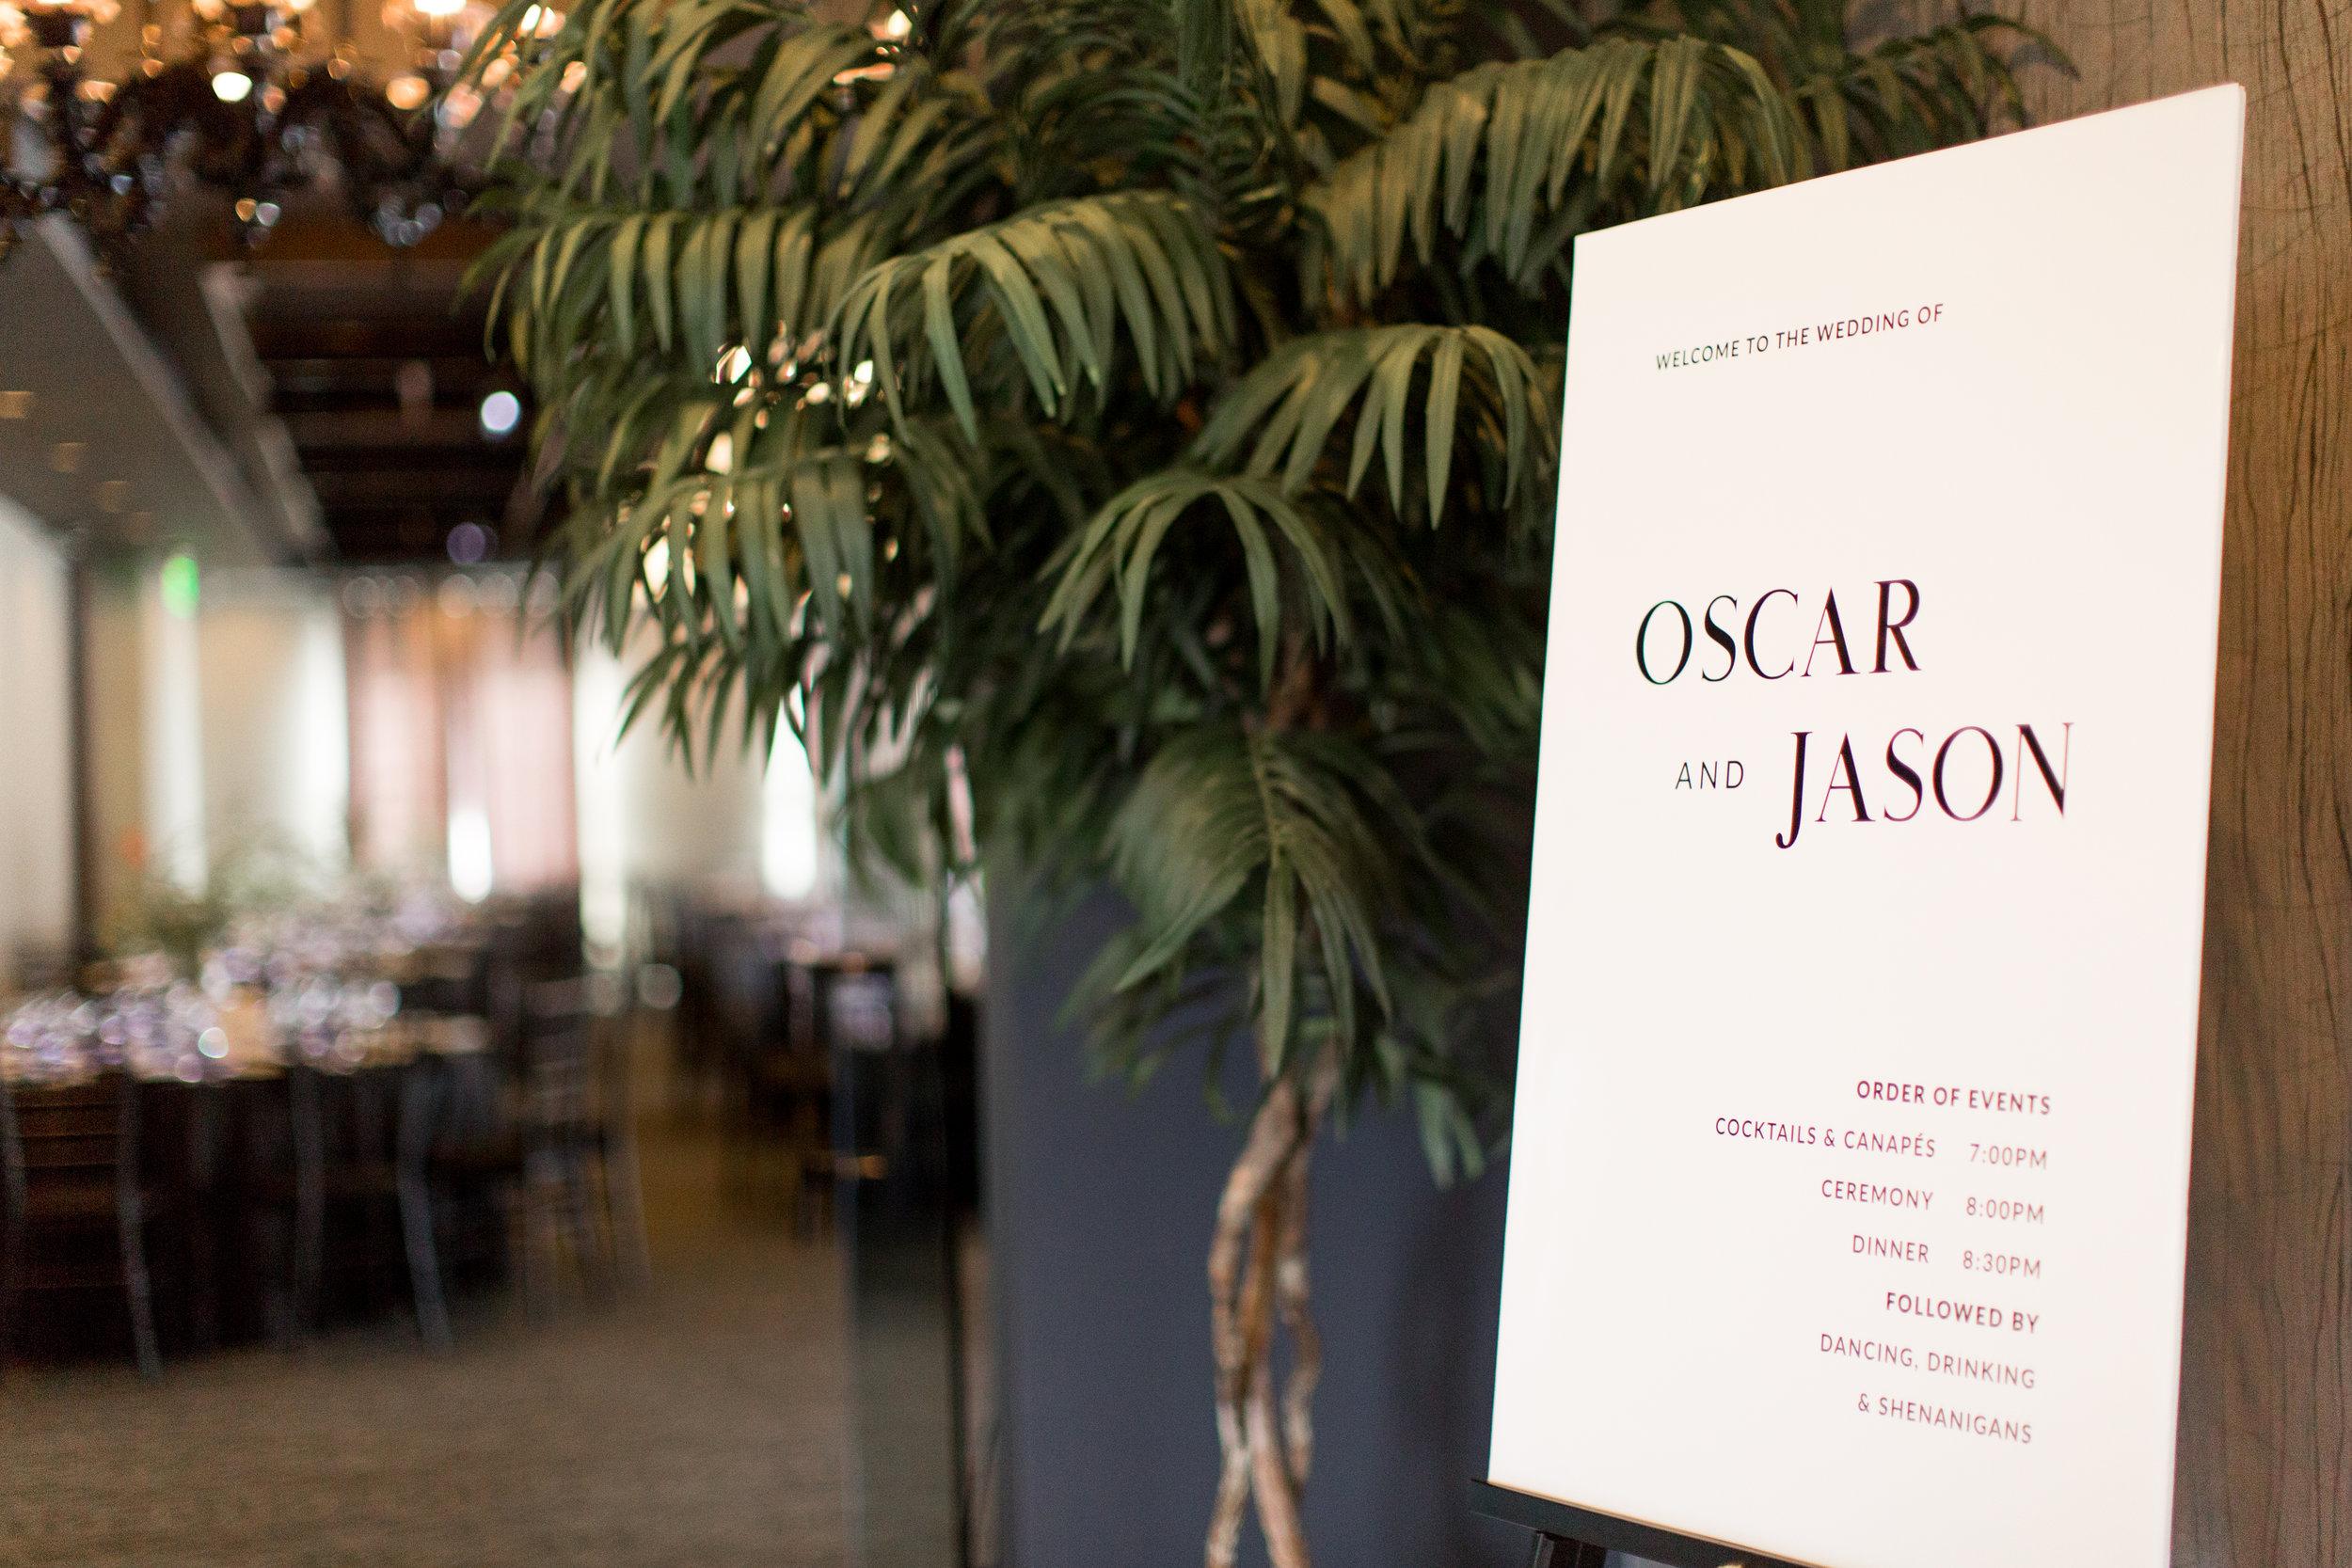 Oscar&Jason_Wedding11.03.17_MichelleKylePhotography-12.jpg